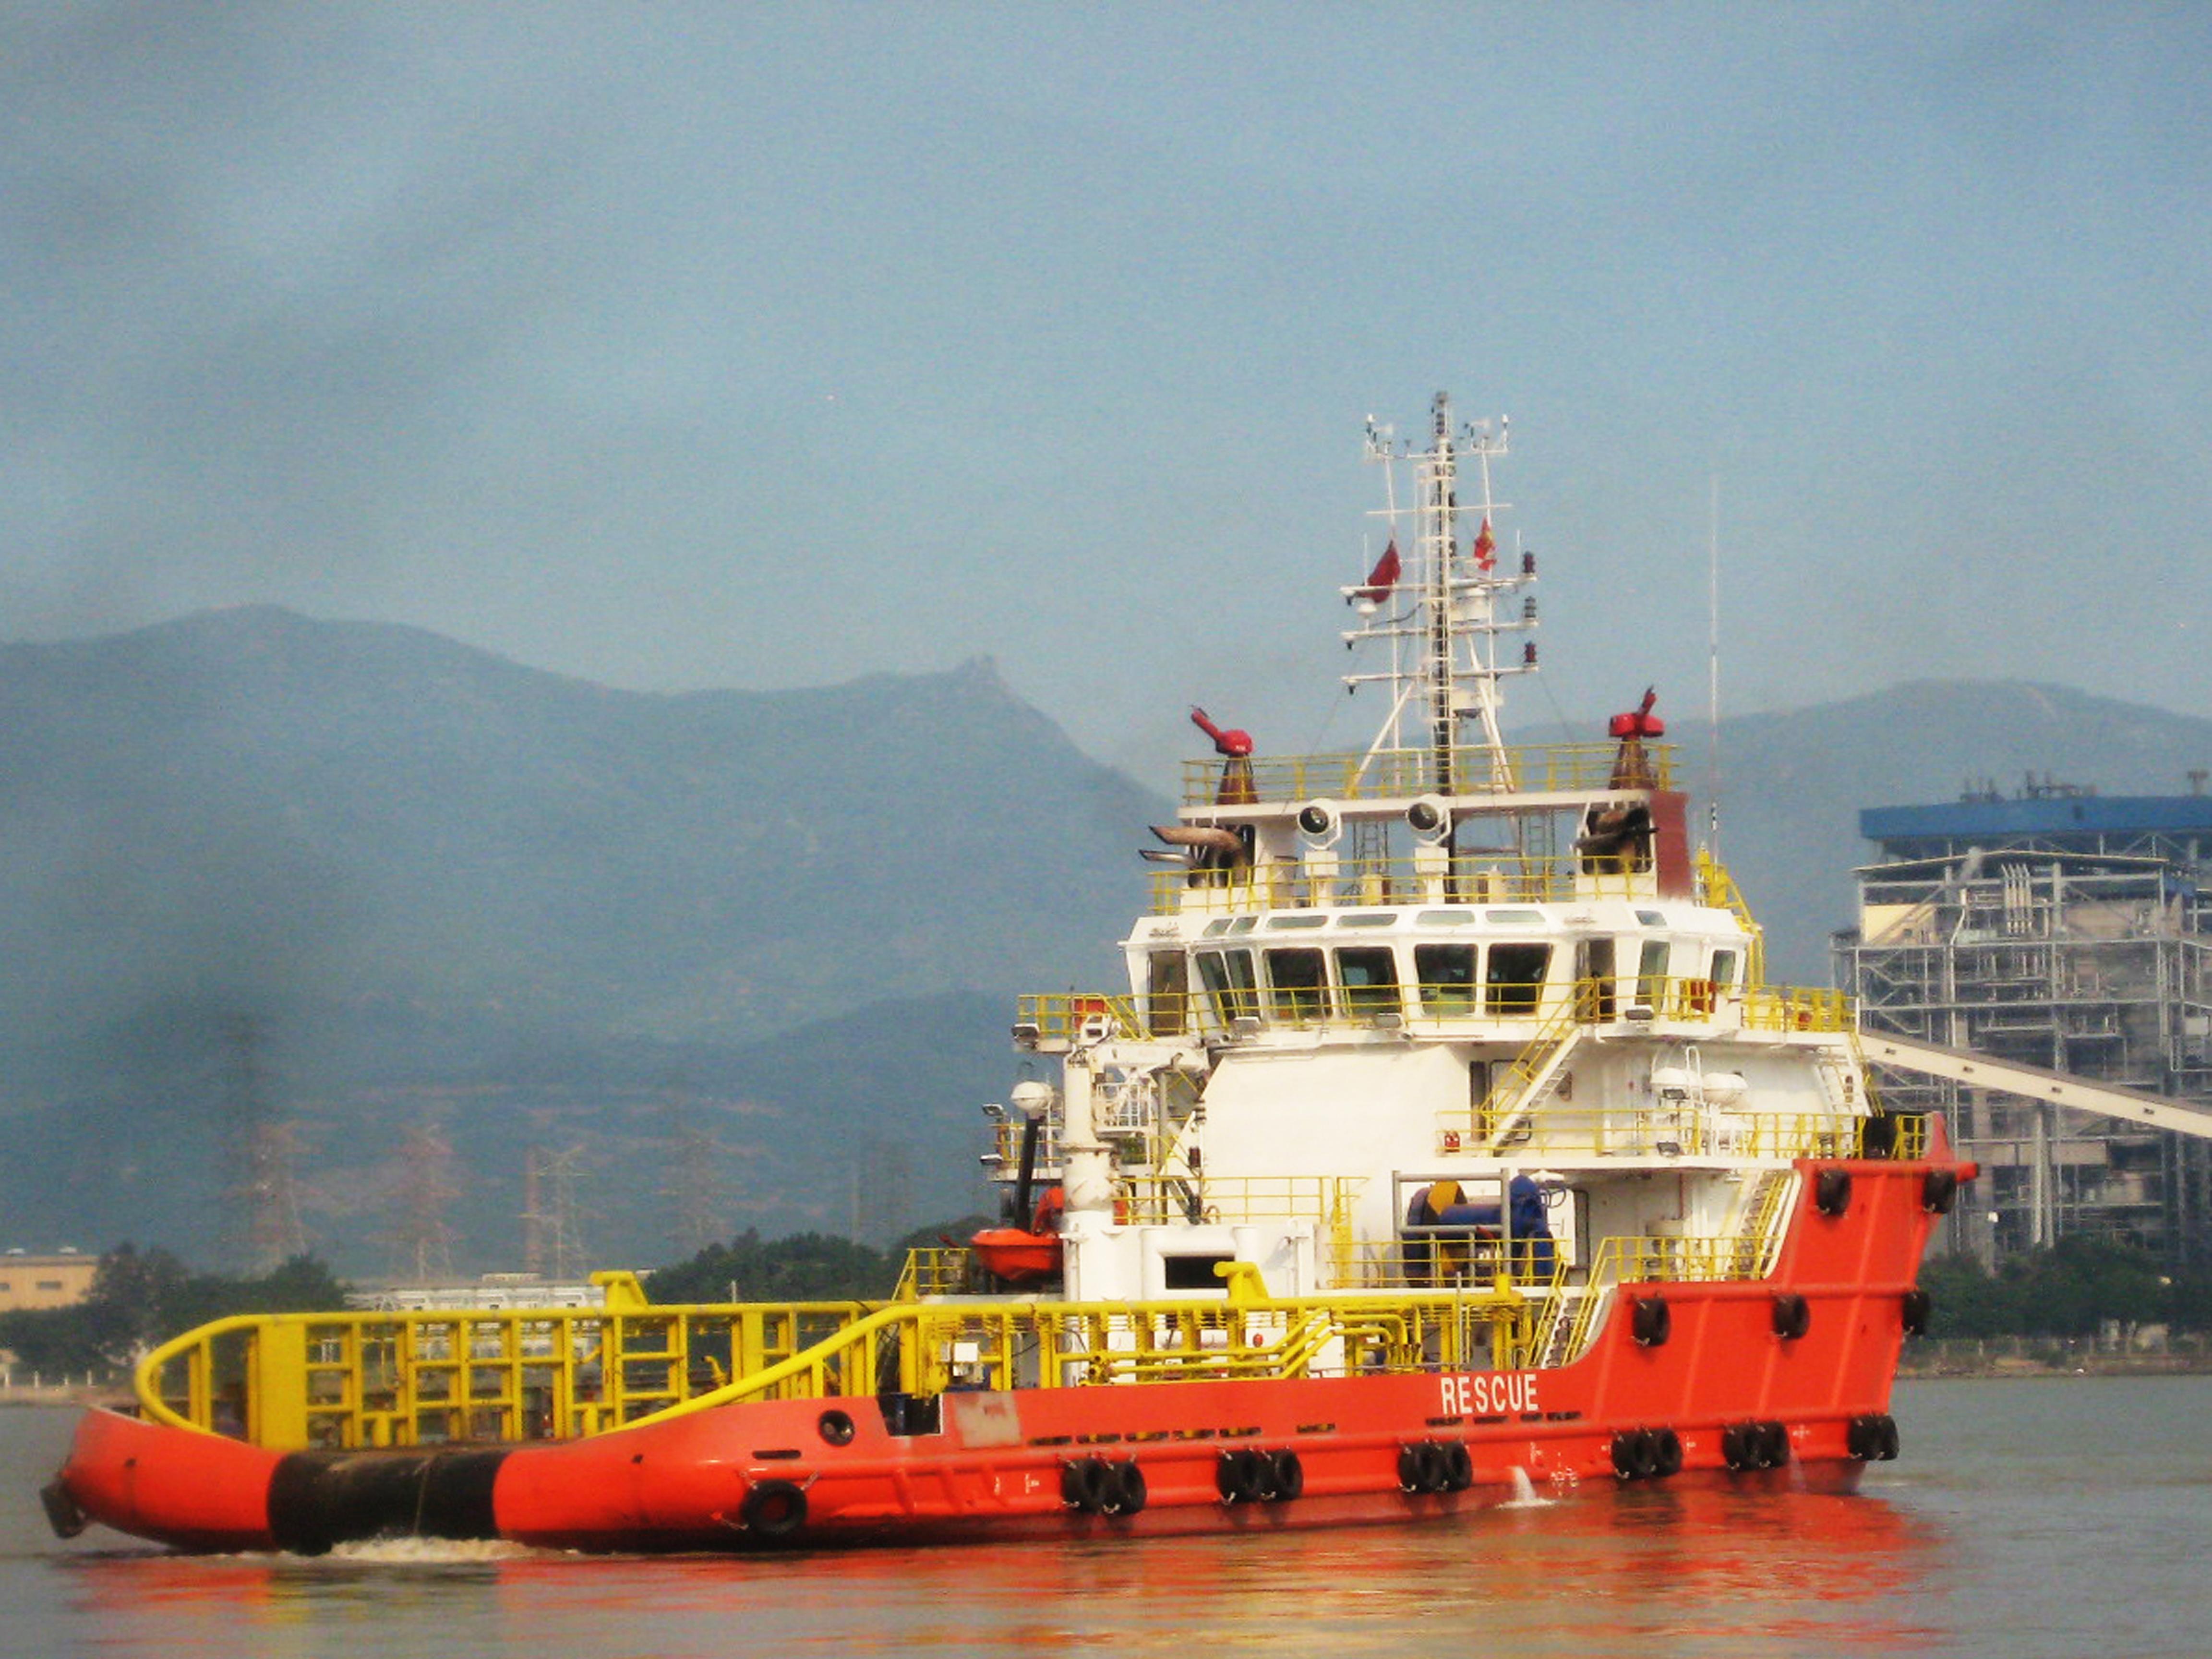 Limin Marine & Offshore